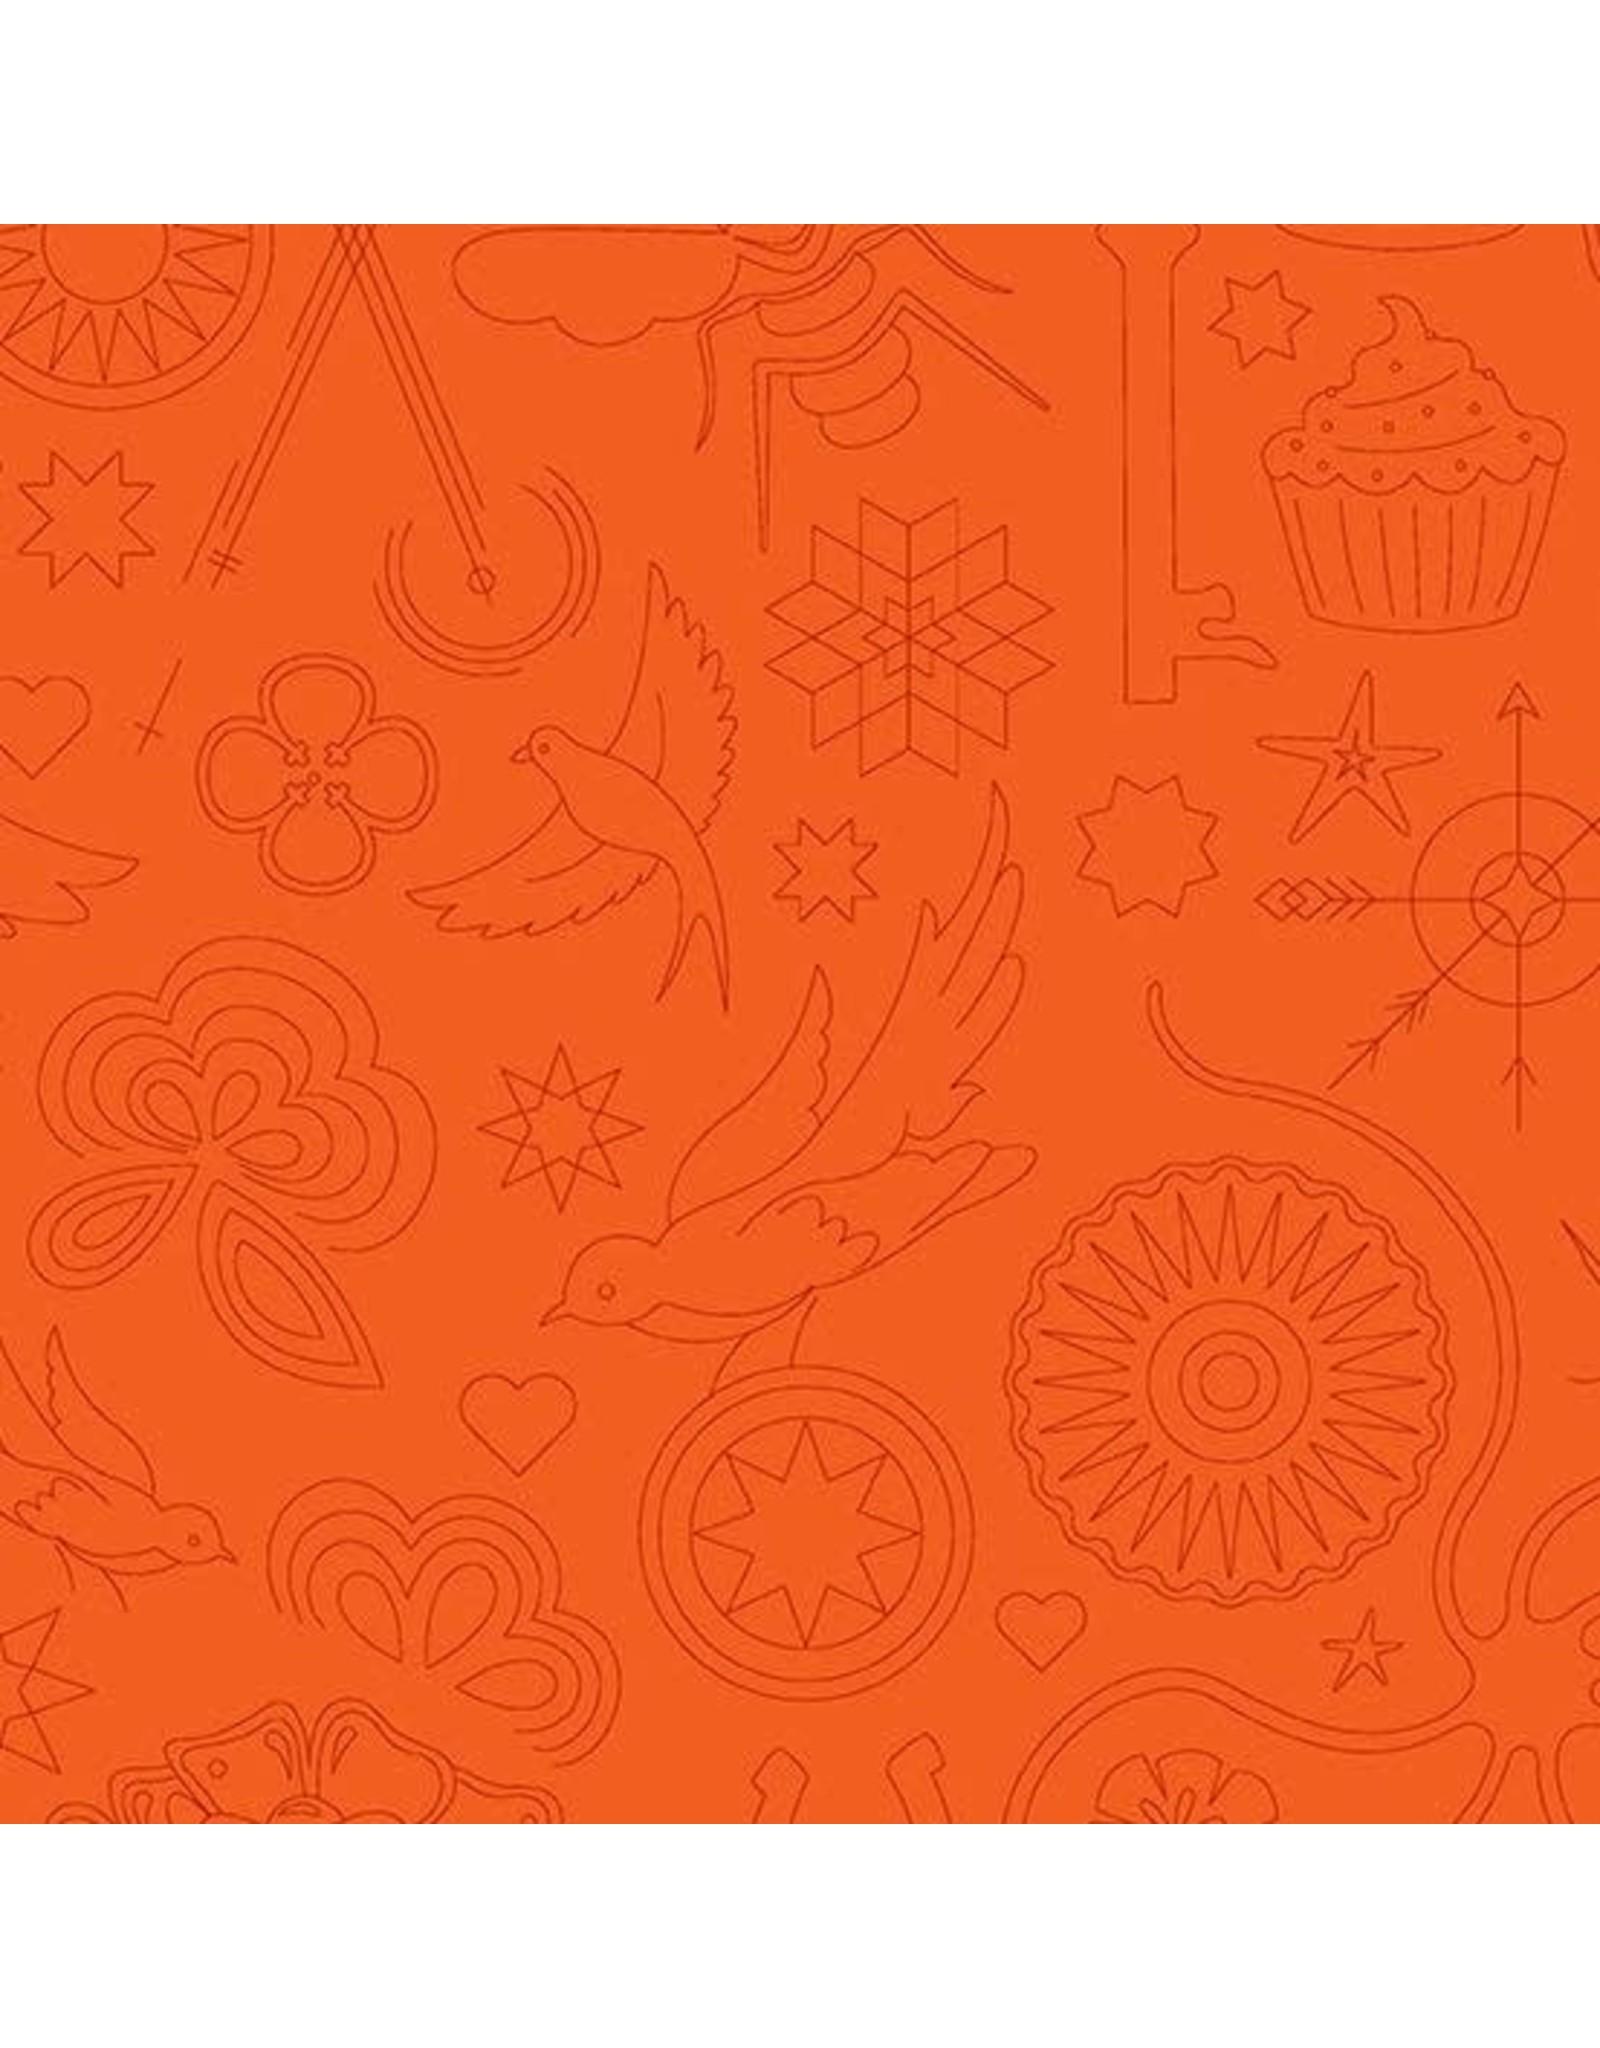 Alison Glass ON SALE-Sun Print 2020, Embroidery in Pumpkin, Fabric FULL-Yards